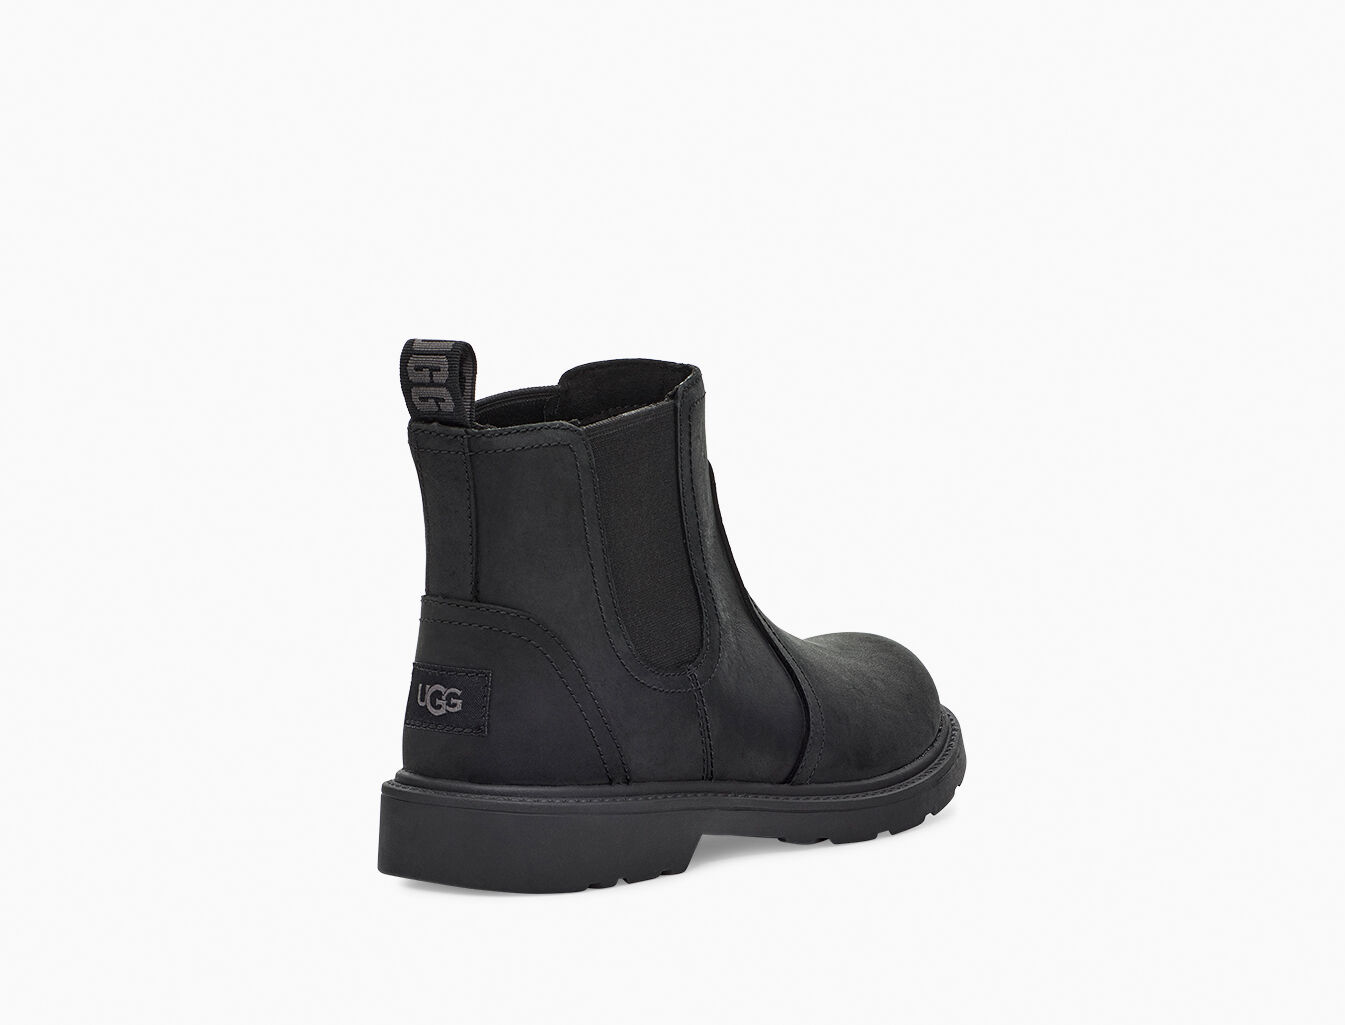 Bolden Weather Kids' Boot   UGG®